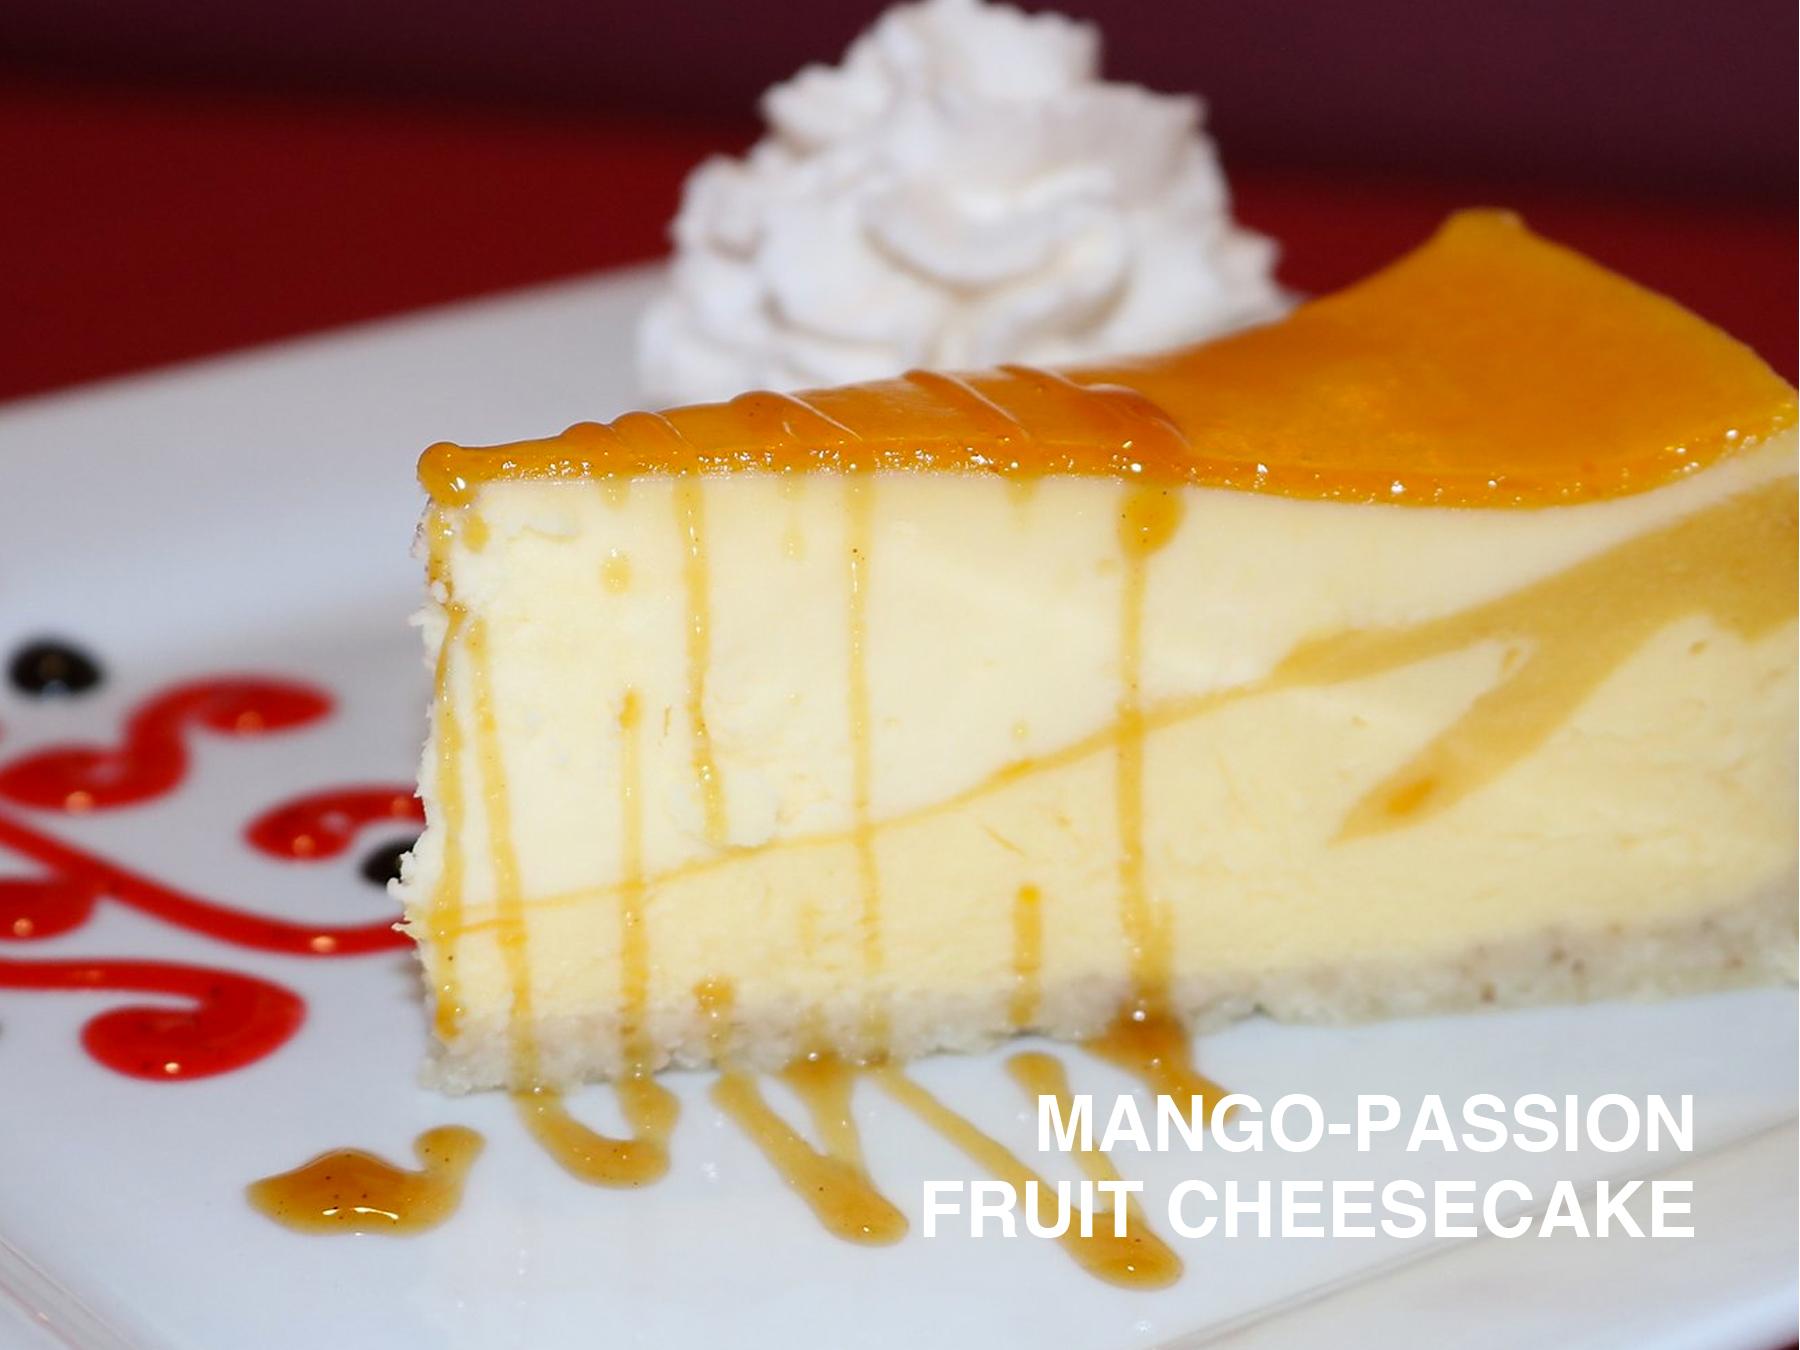 MANGO-PASSION FRUIT CHEESECAKE